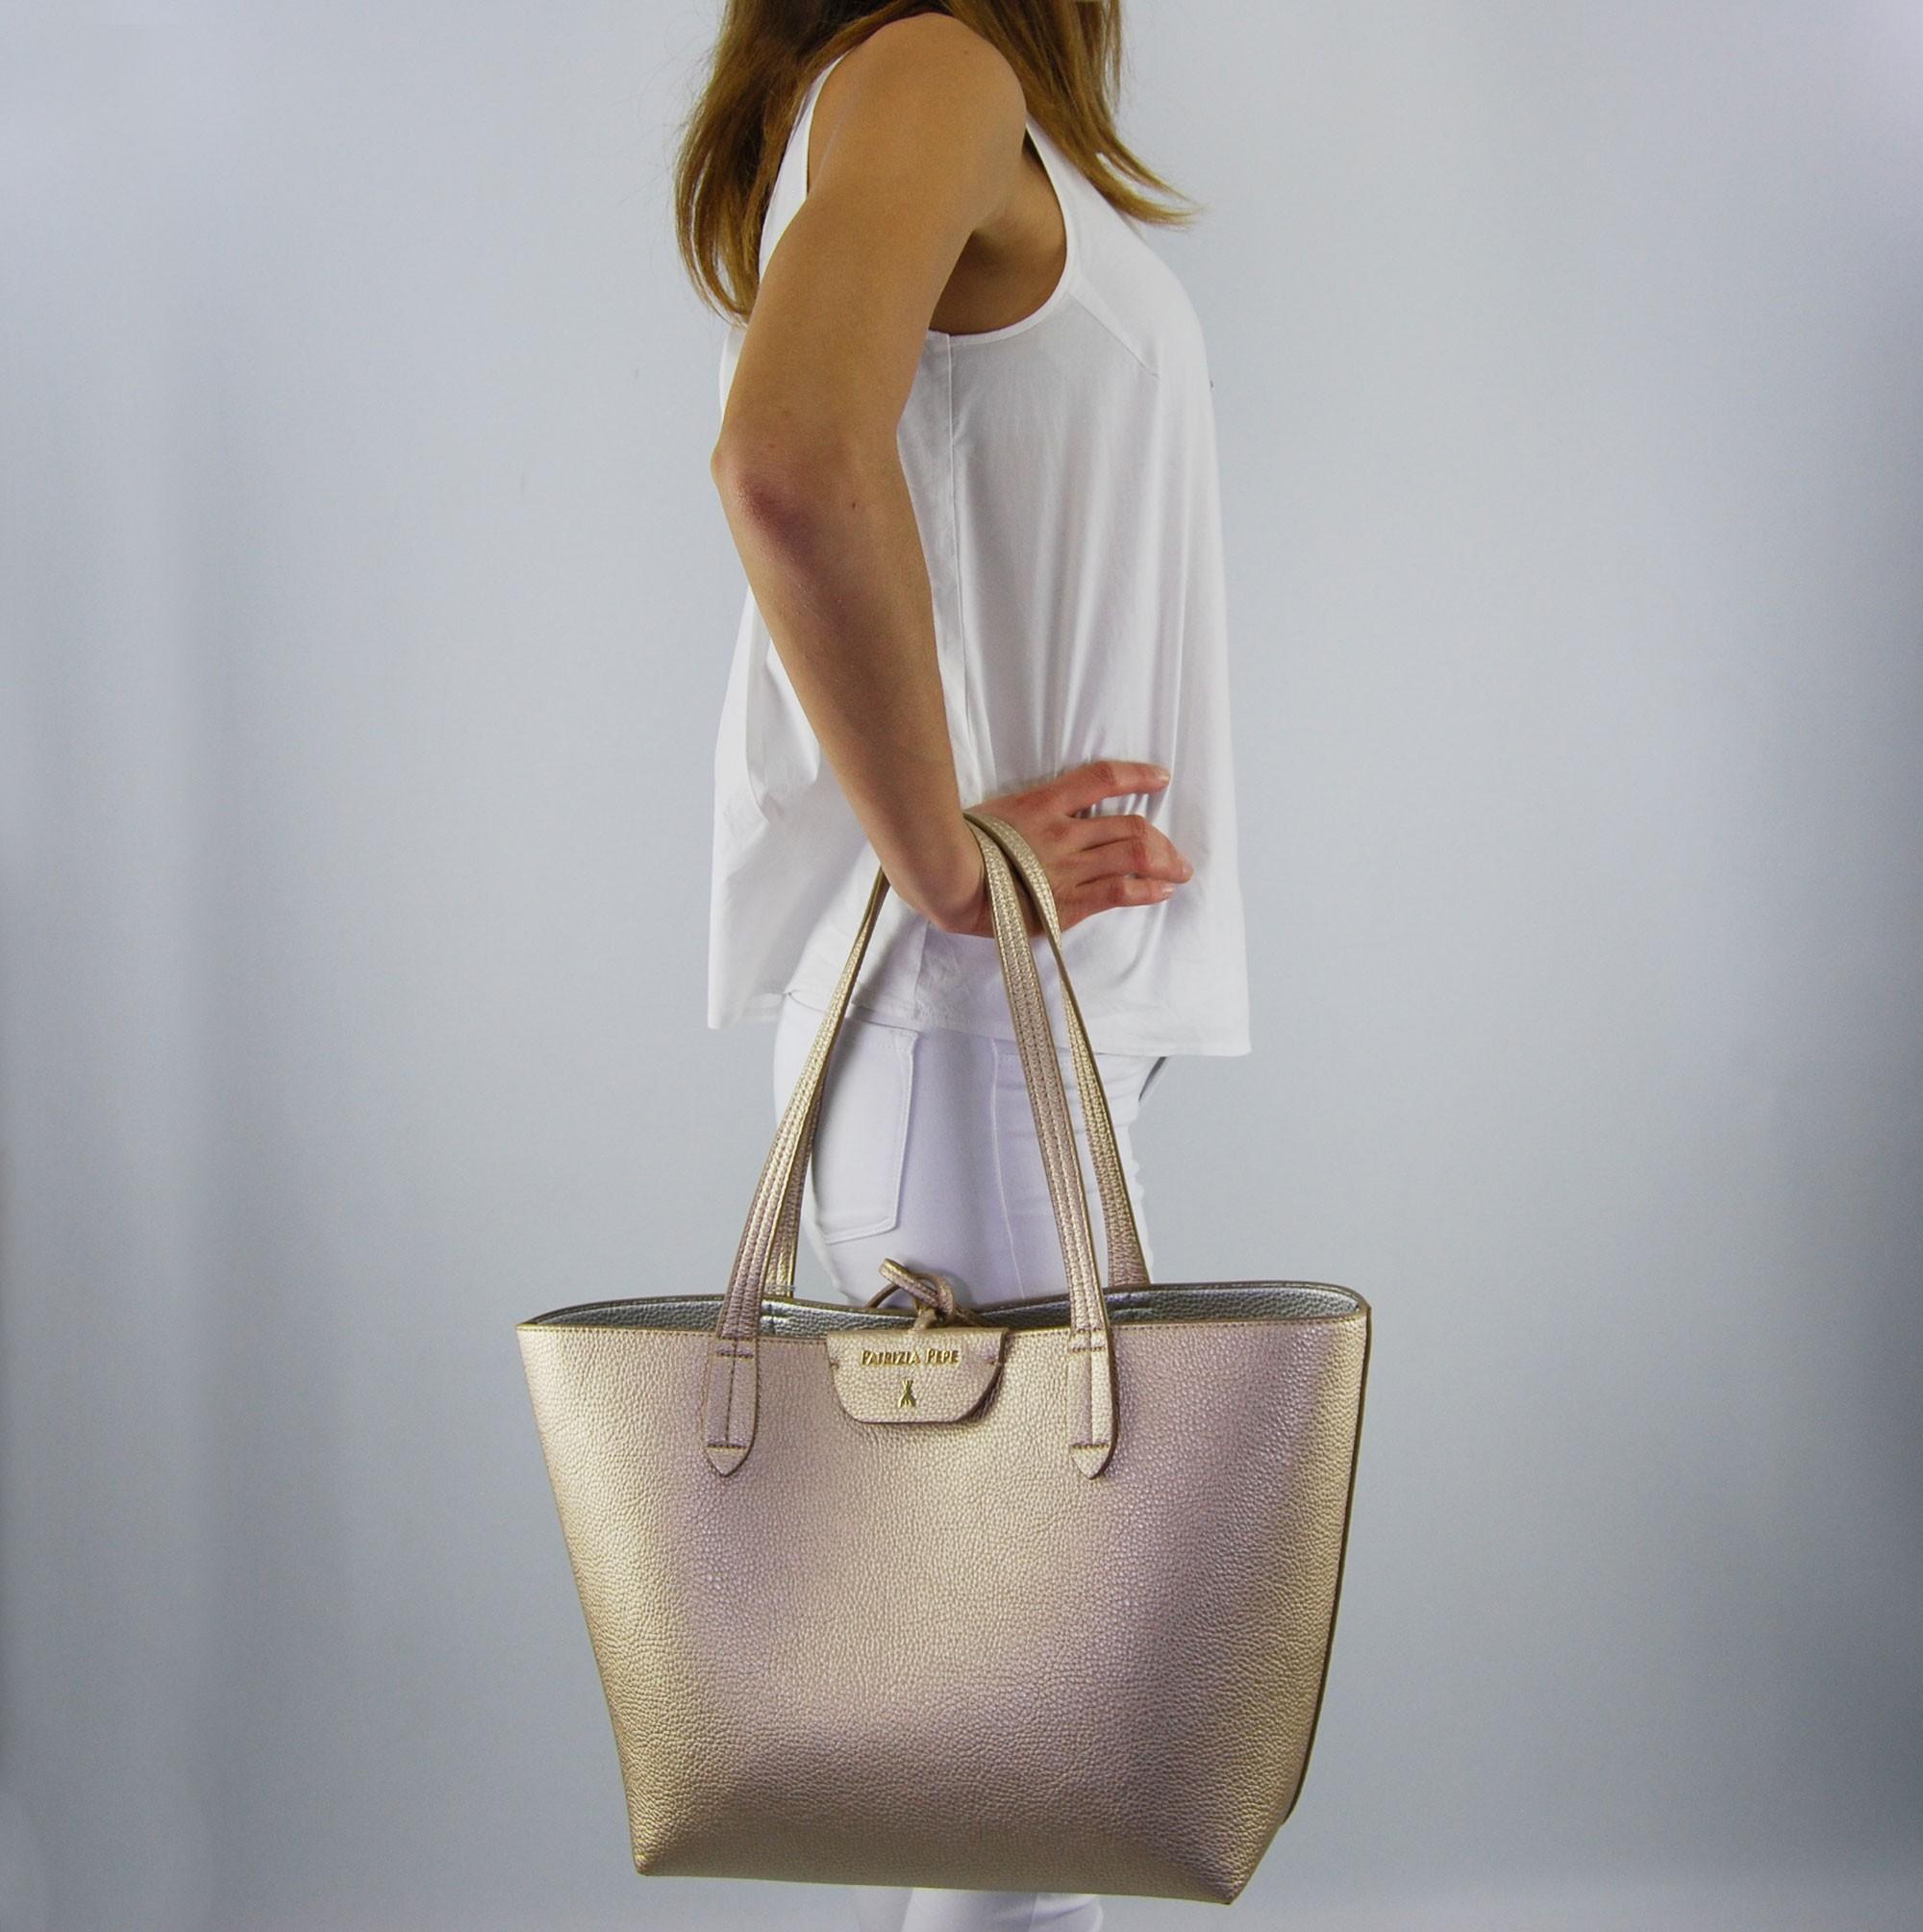 sito affidabile vendita calda genuina davvero comodo Shopping bag by Patrizia Pepe reversible gold silver, new gold silver